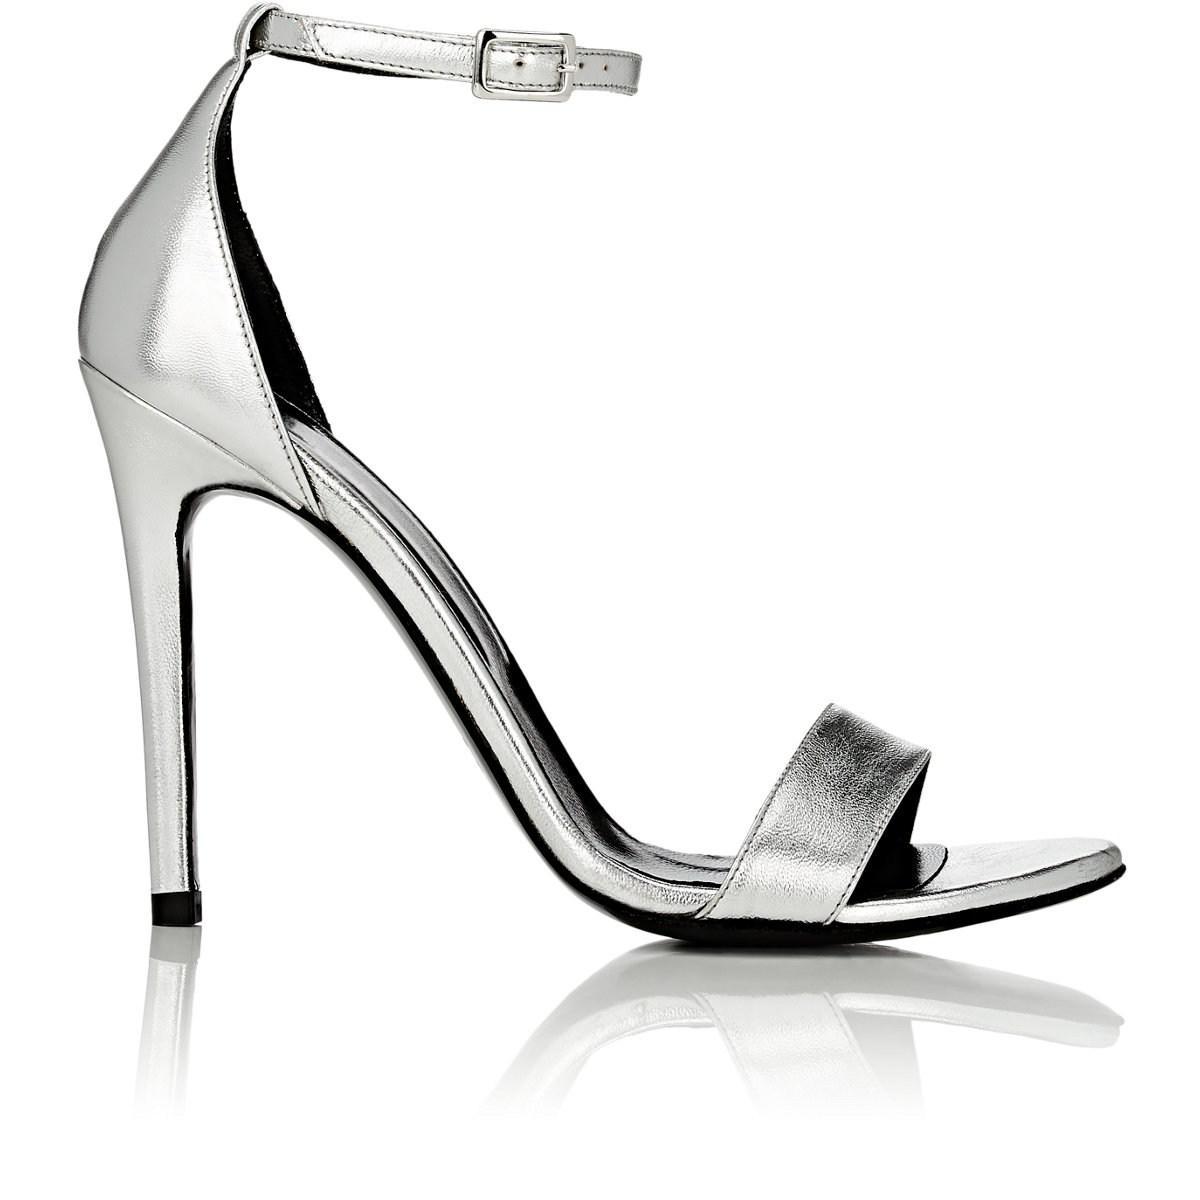 cbf241aa7395 Lyst - Barneys New York Metallic Leather Ankle-strap Sandals in Metallic